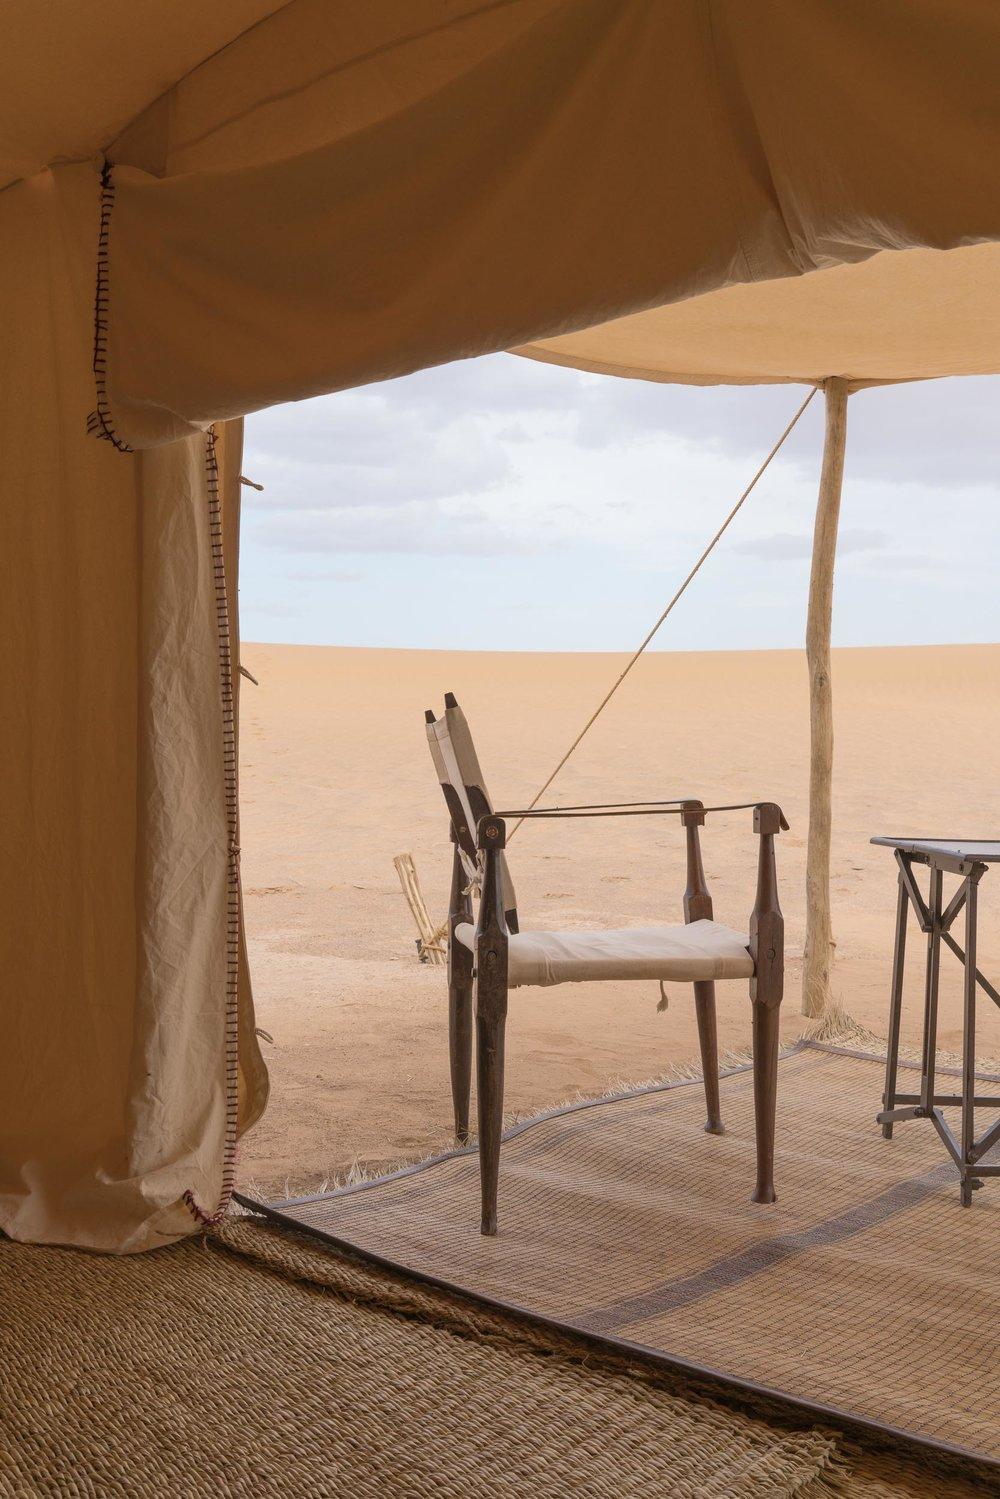 the_getaway_edit_morocco_dar_ahlam_sahara_desert-16.jpg